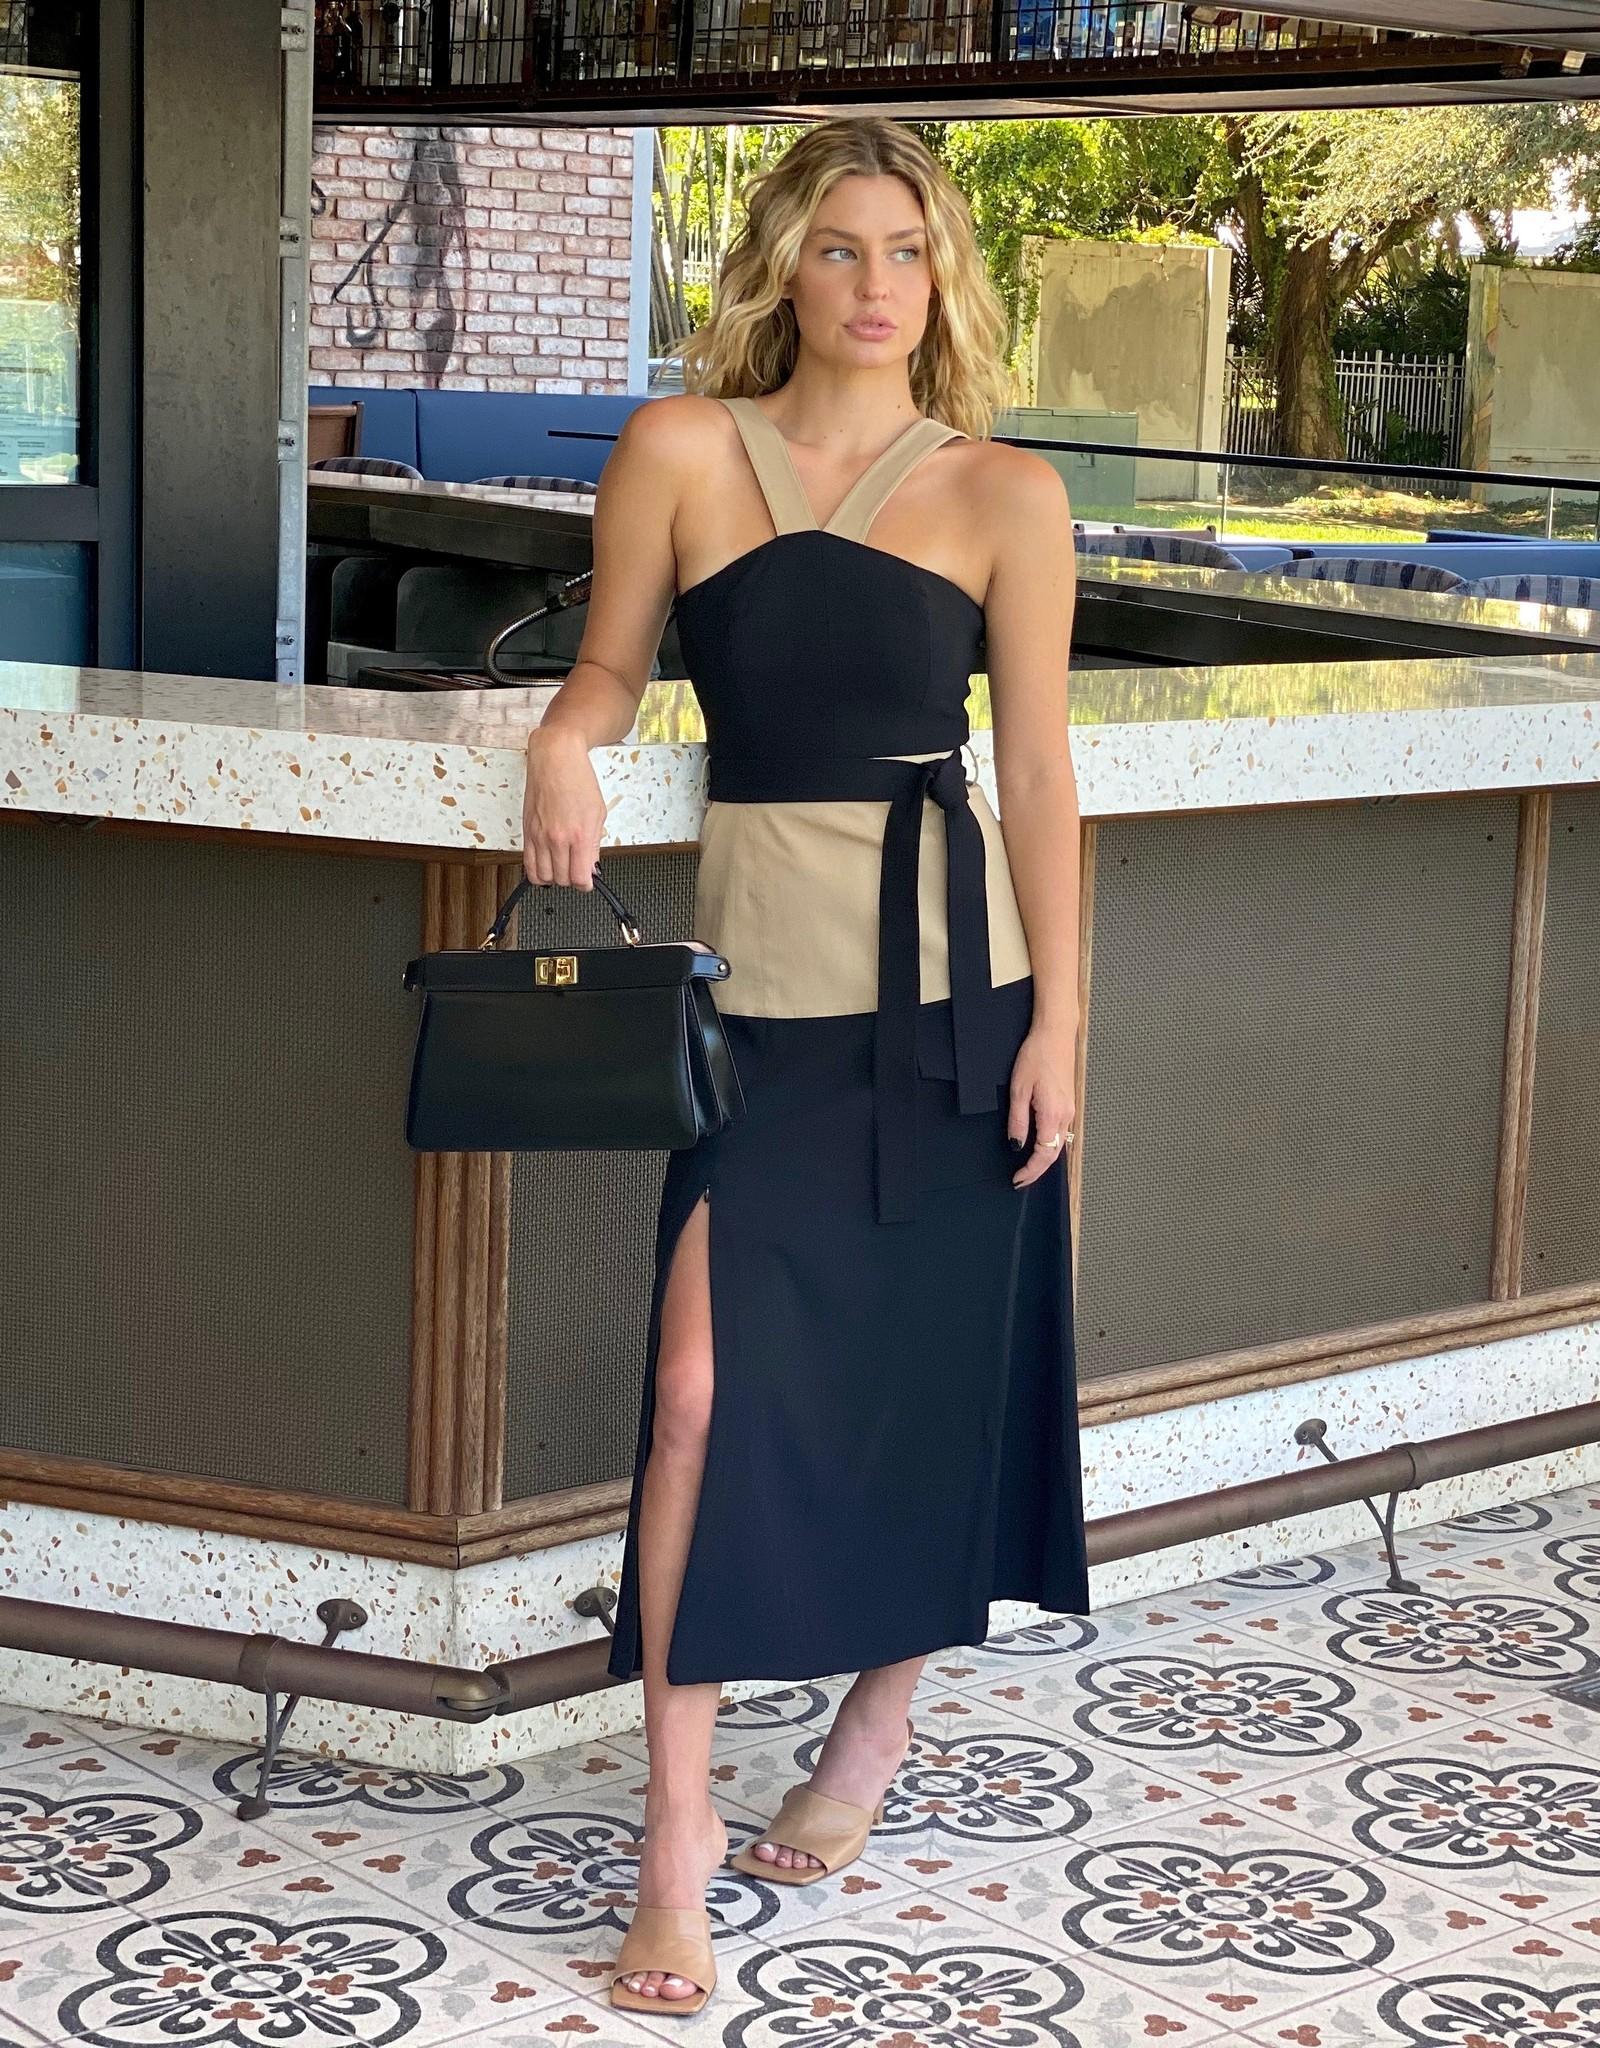 Alexis Erina Dress Tan/Black